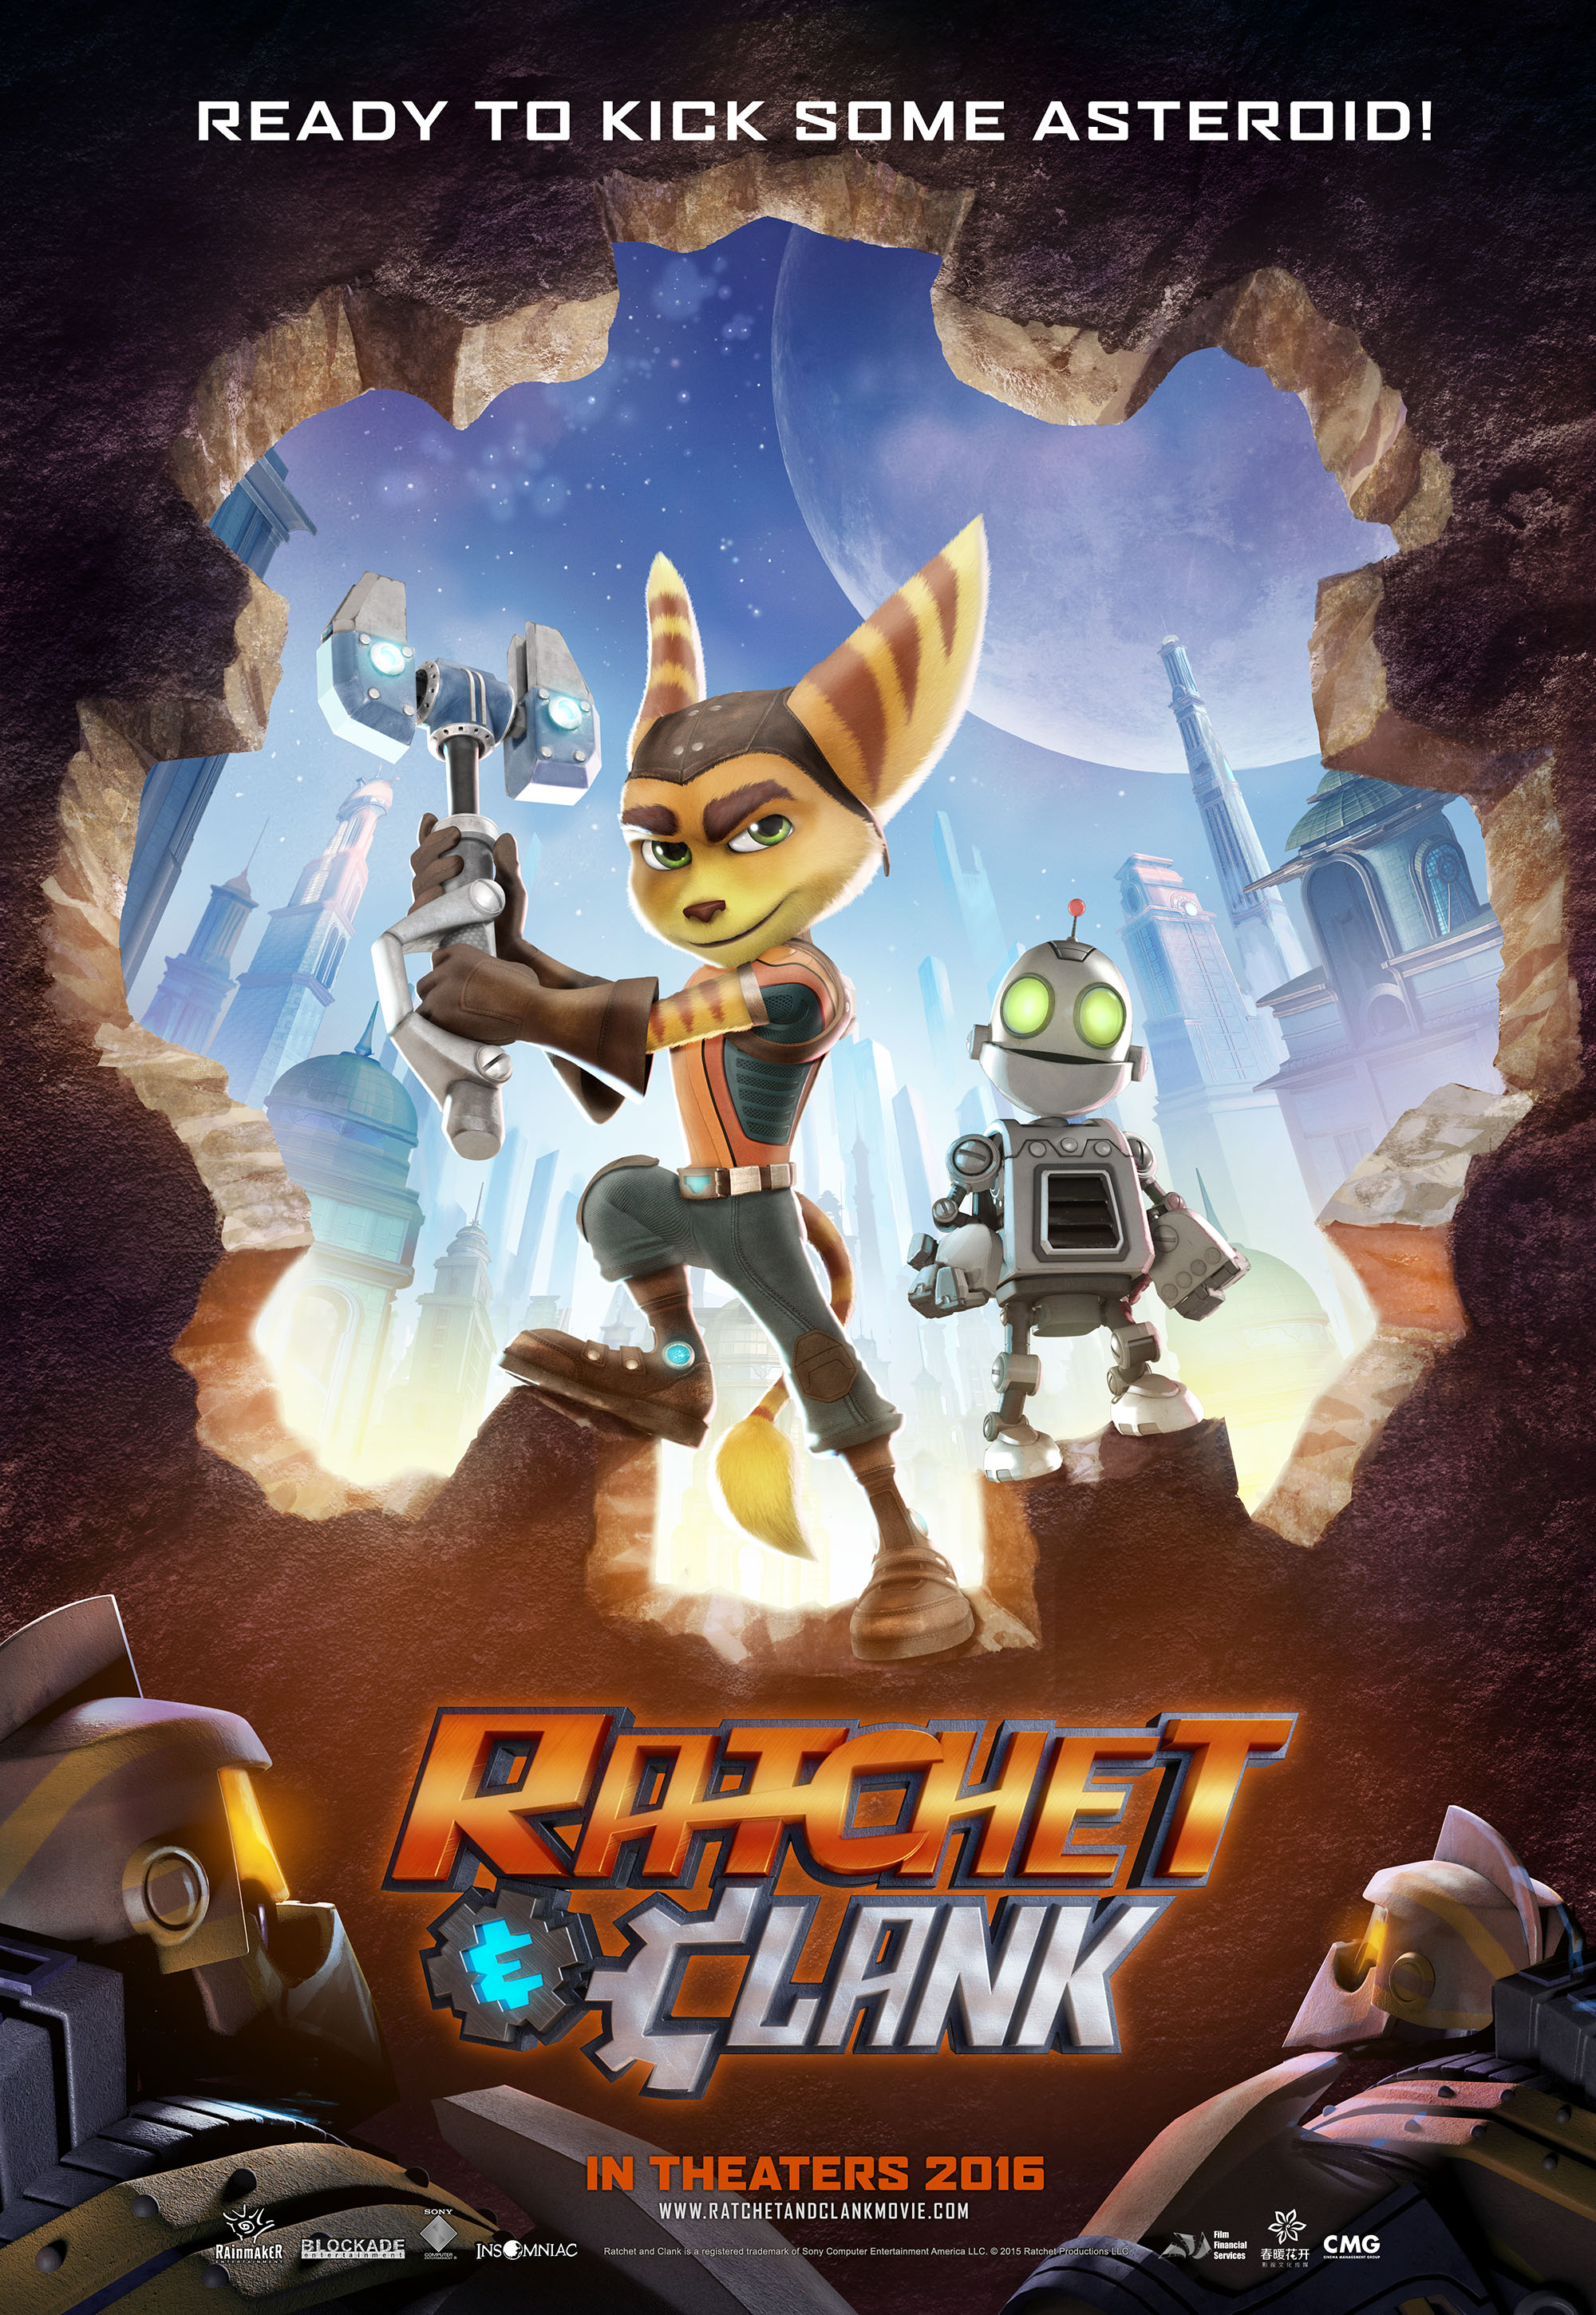 Movie releases april 29